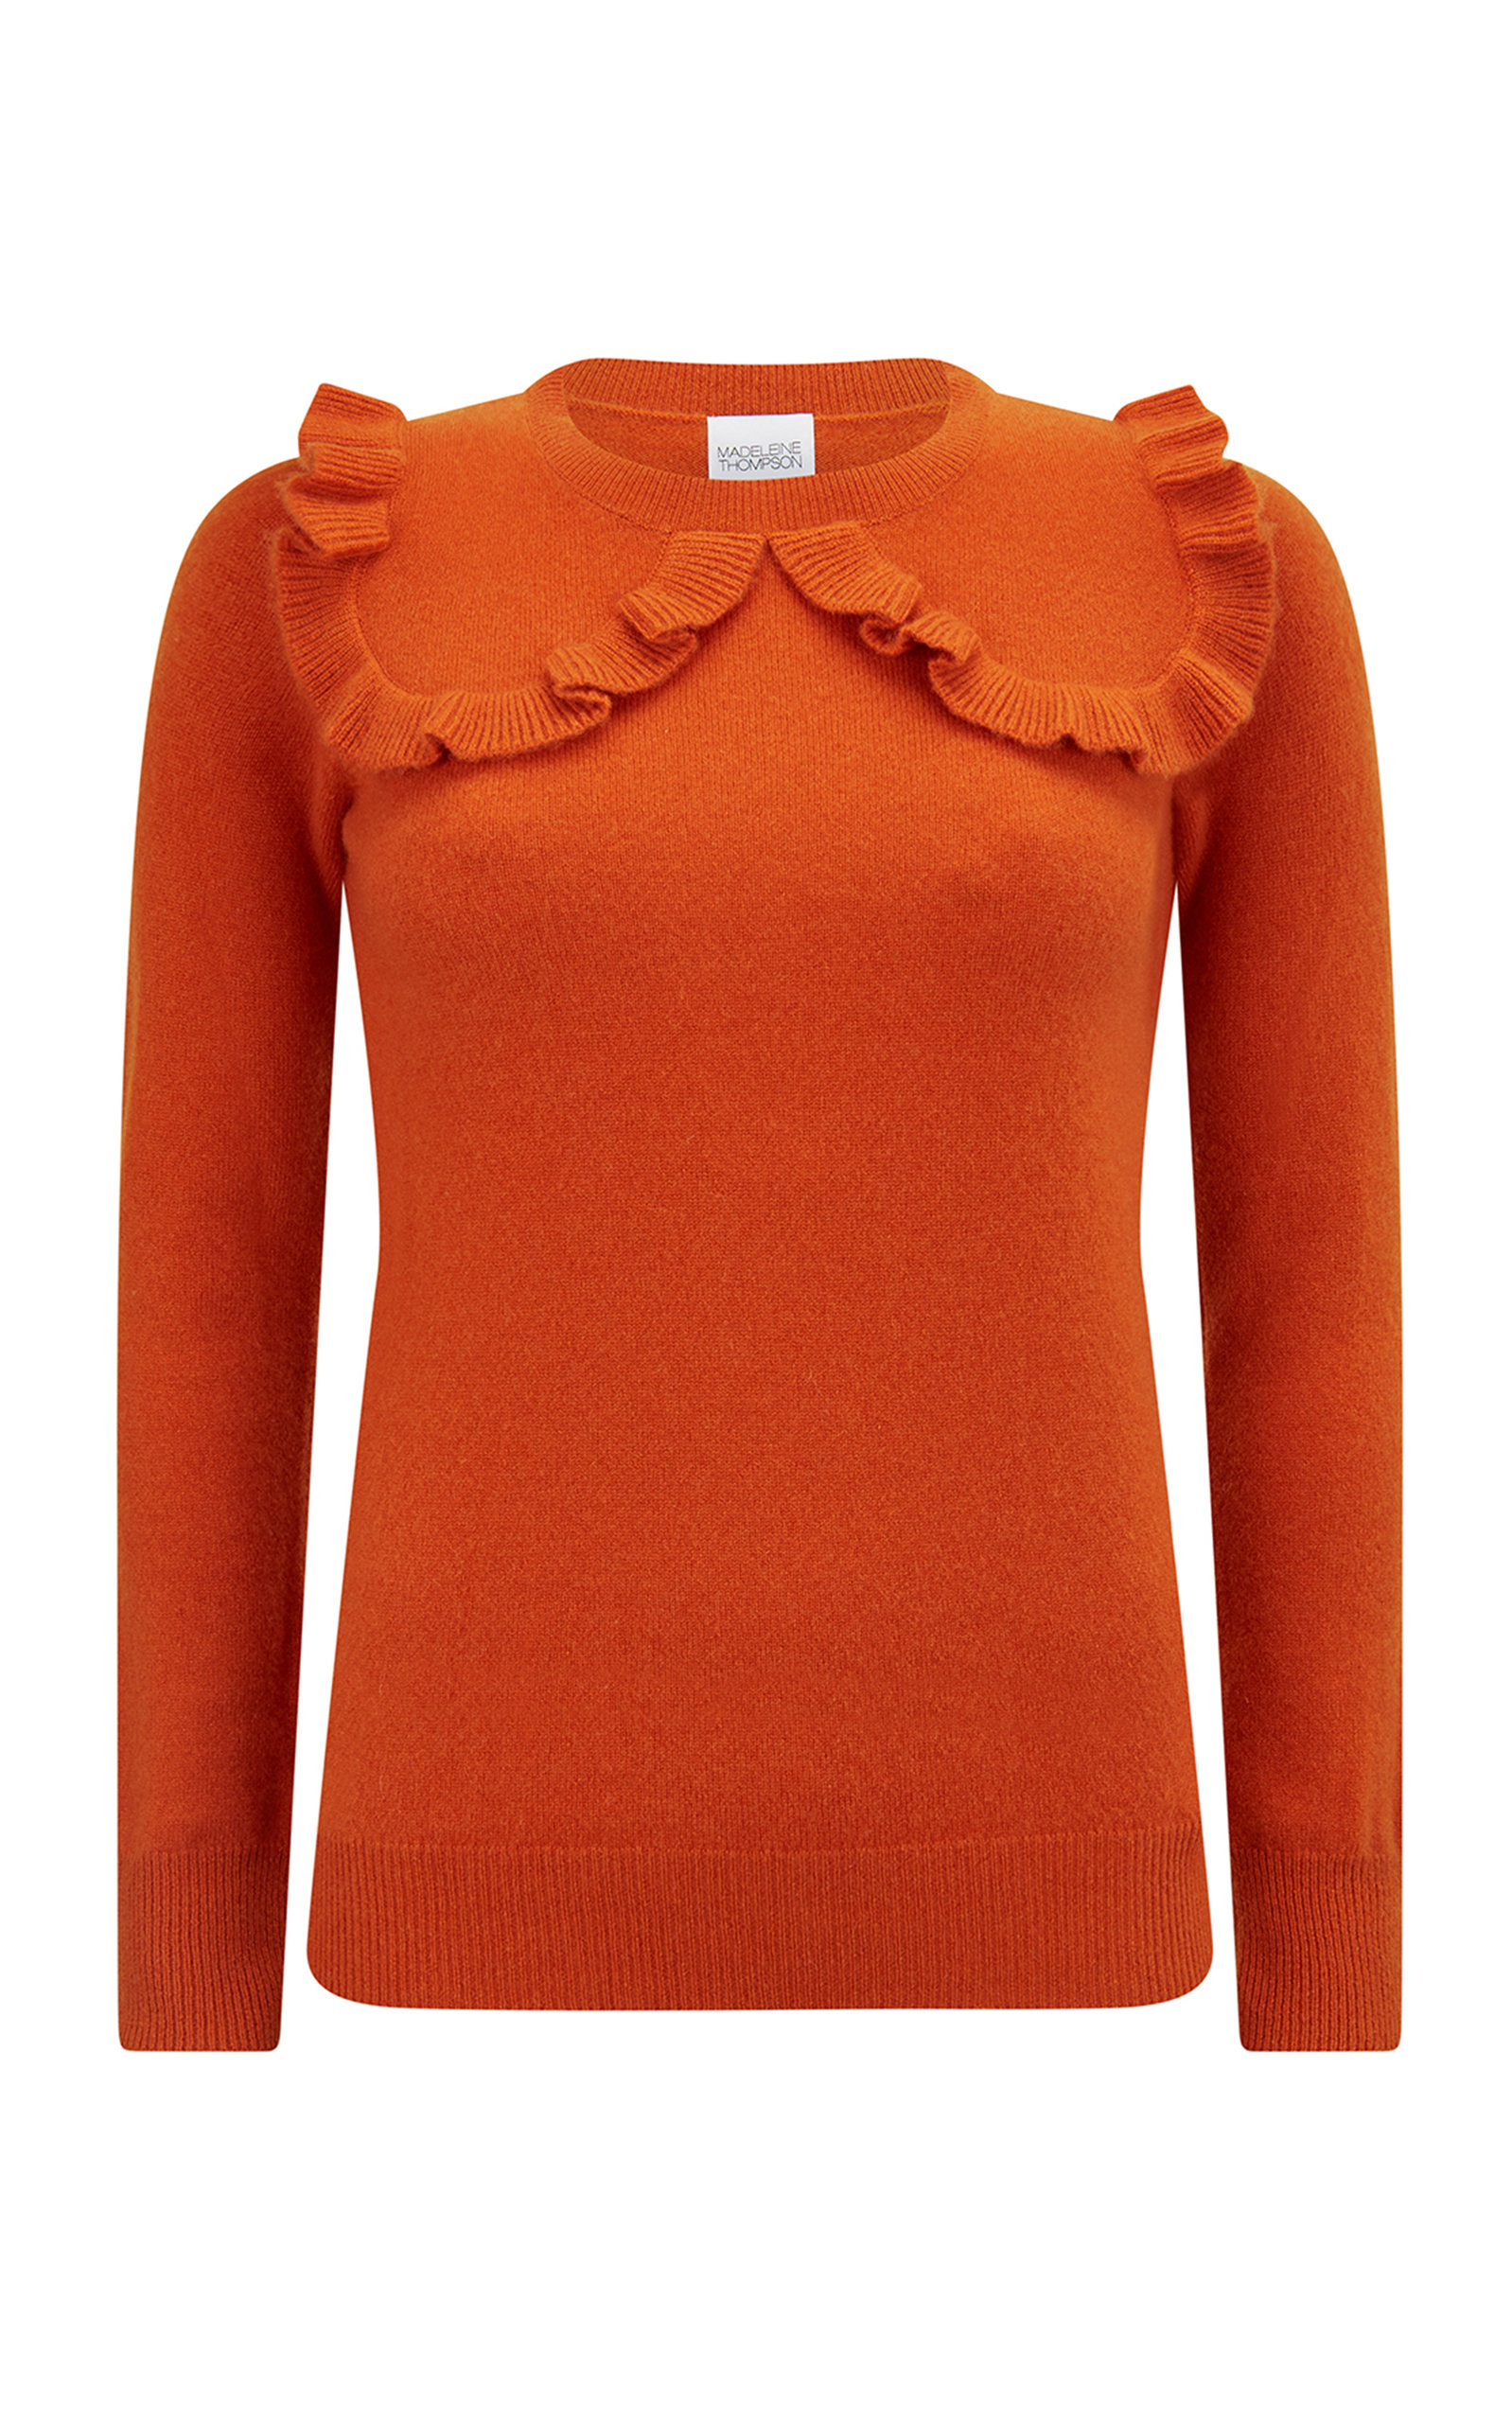 Women's Adelboden Ruffled Cashmere Sweater